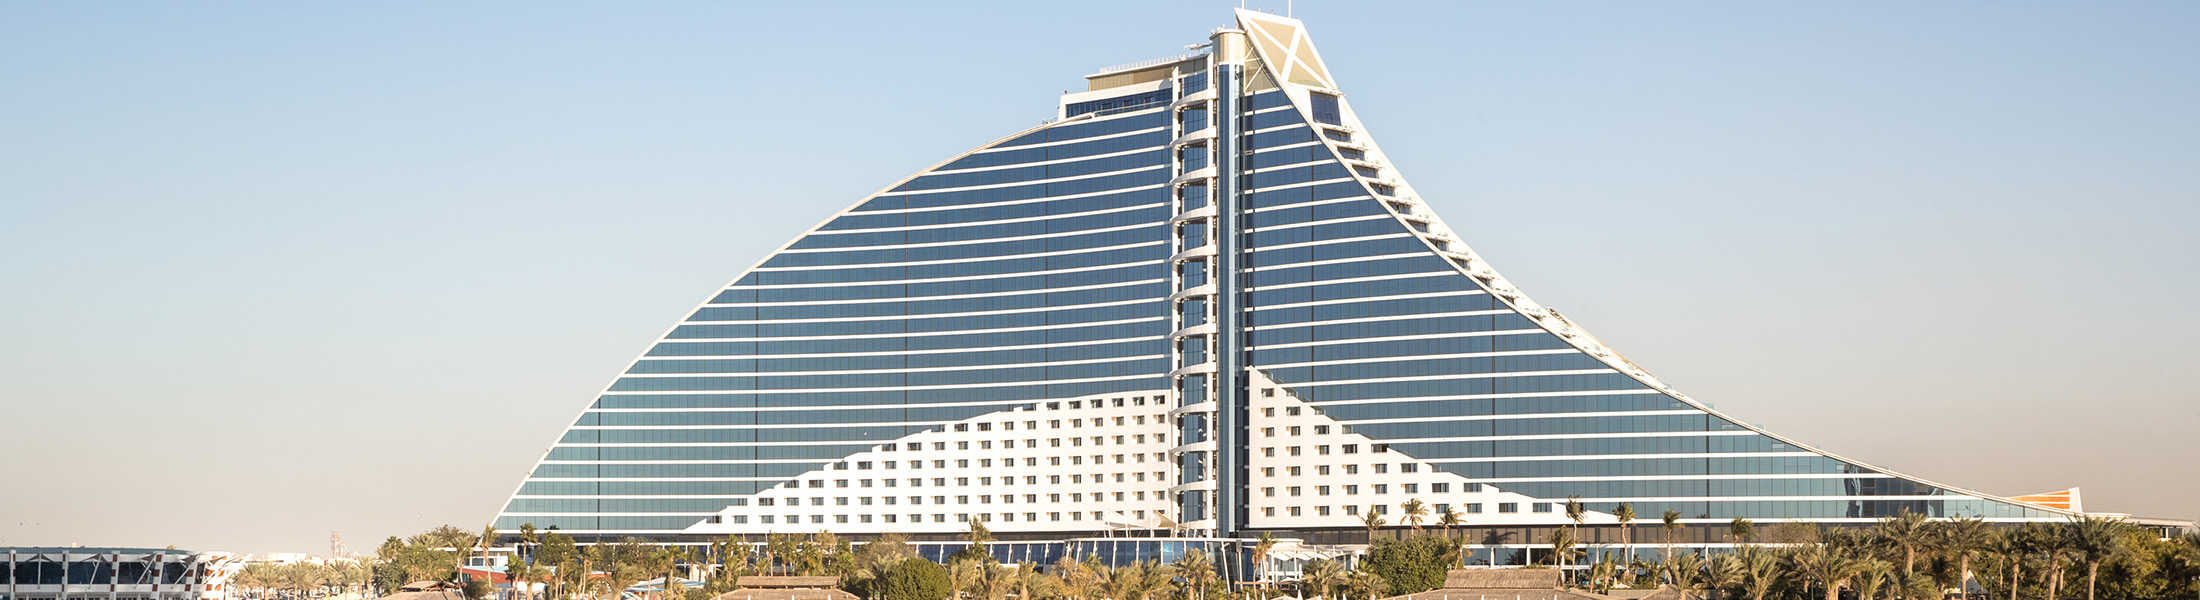 Exterior of the Jumeirah Beach Hotel